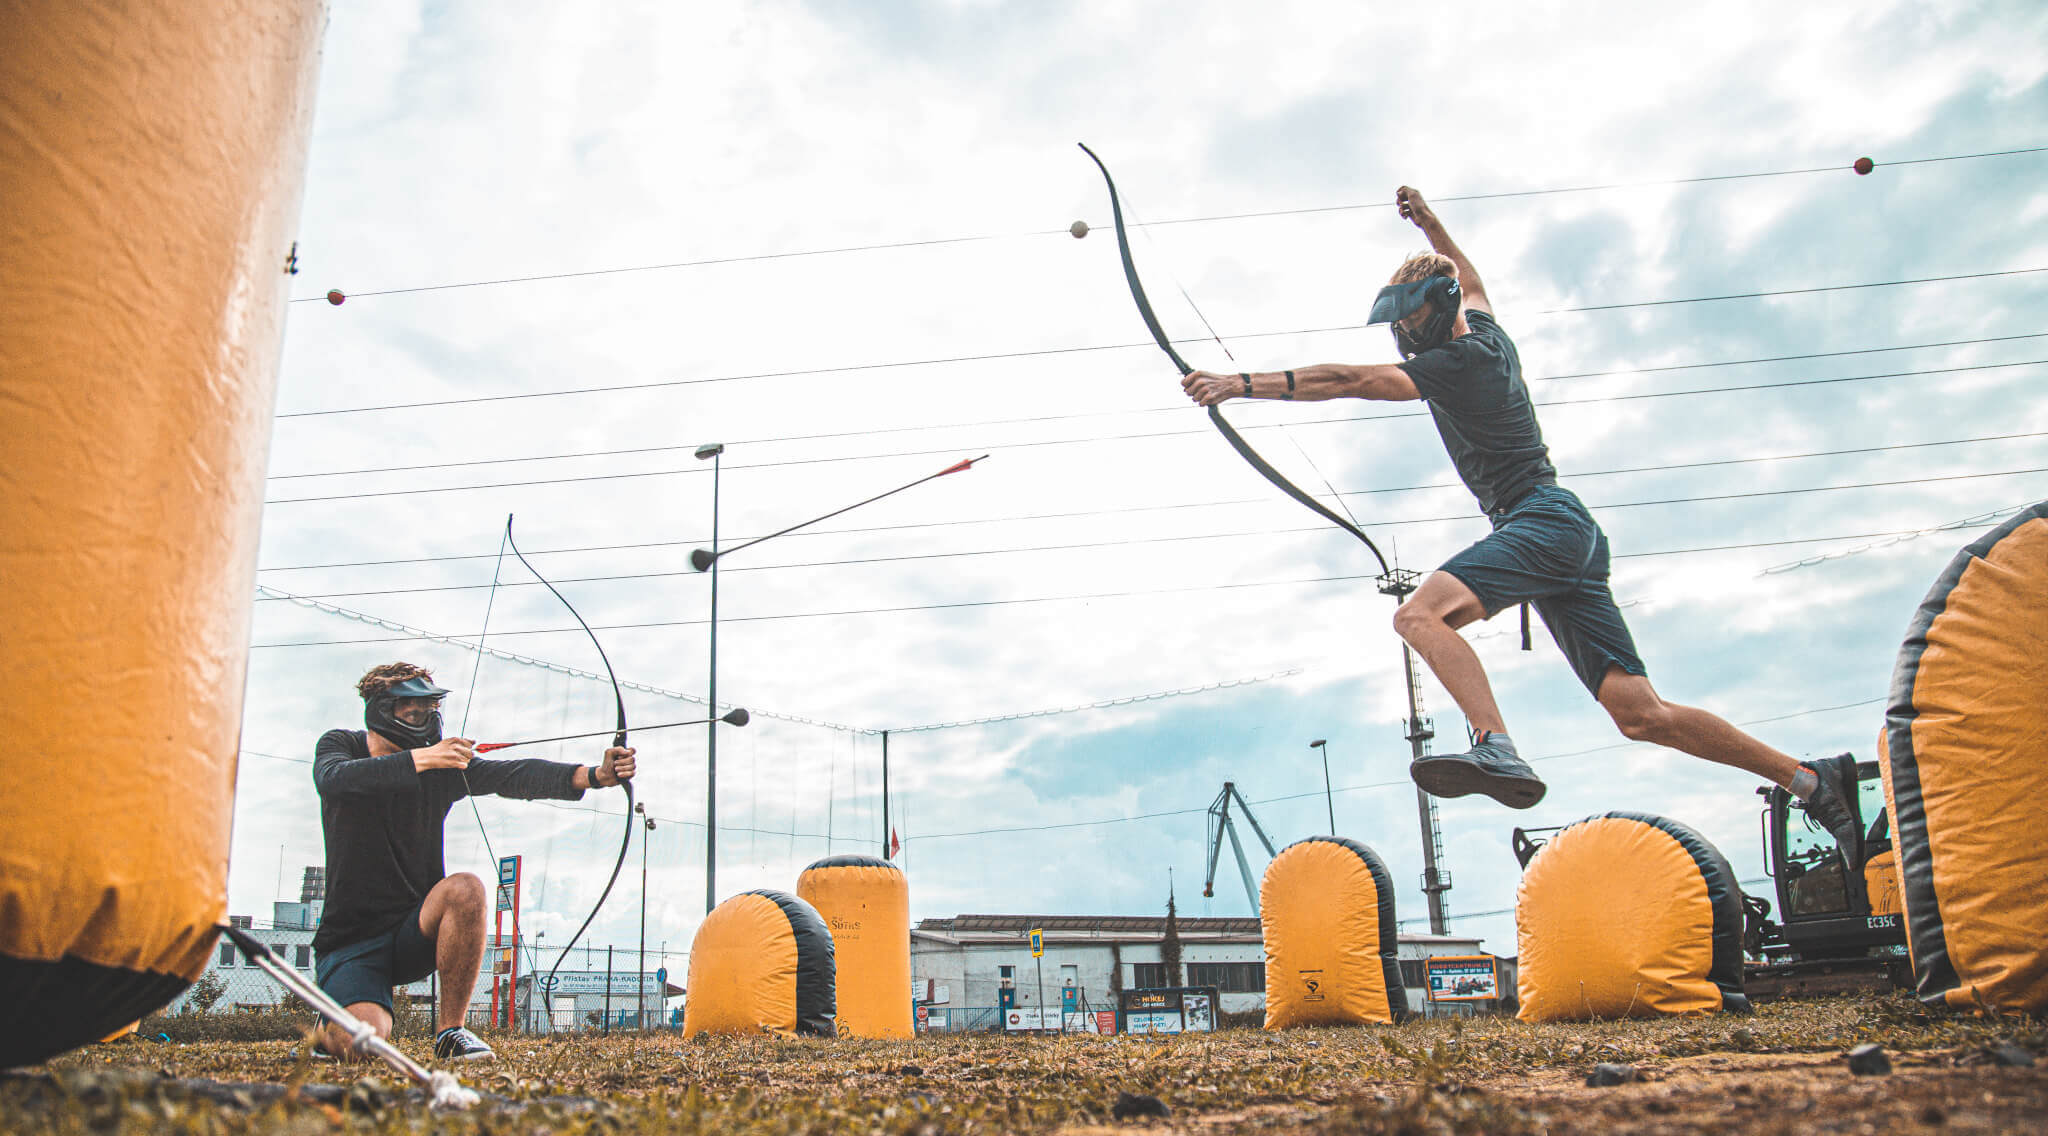 archery game prague